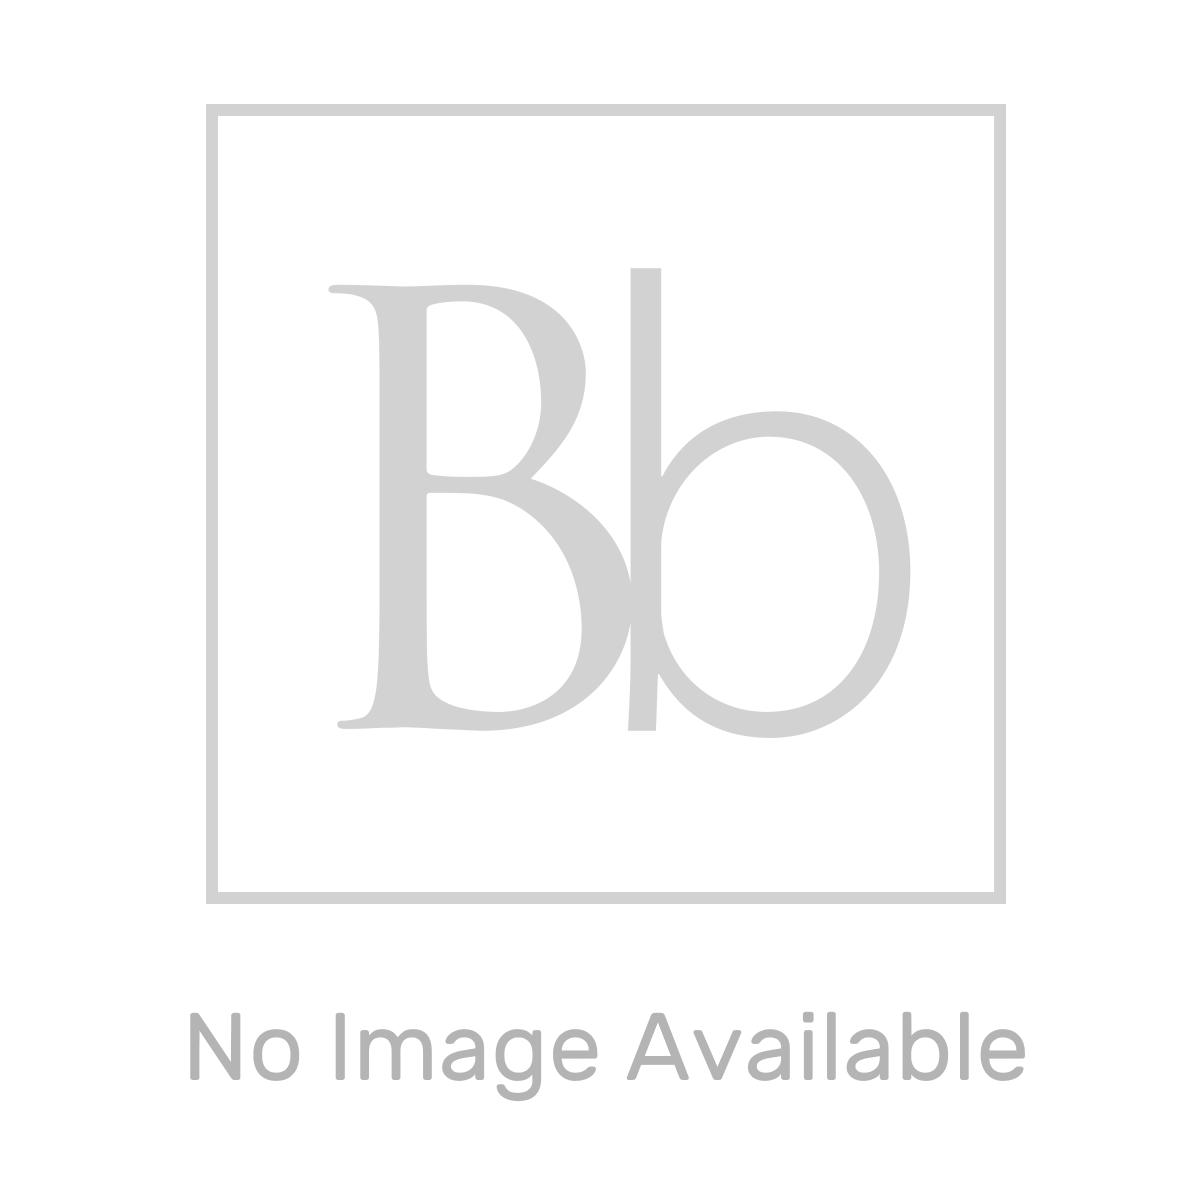 RAK Surface Light Sand Lappato Tile 750 x 750mm